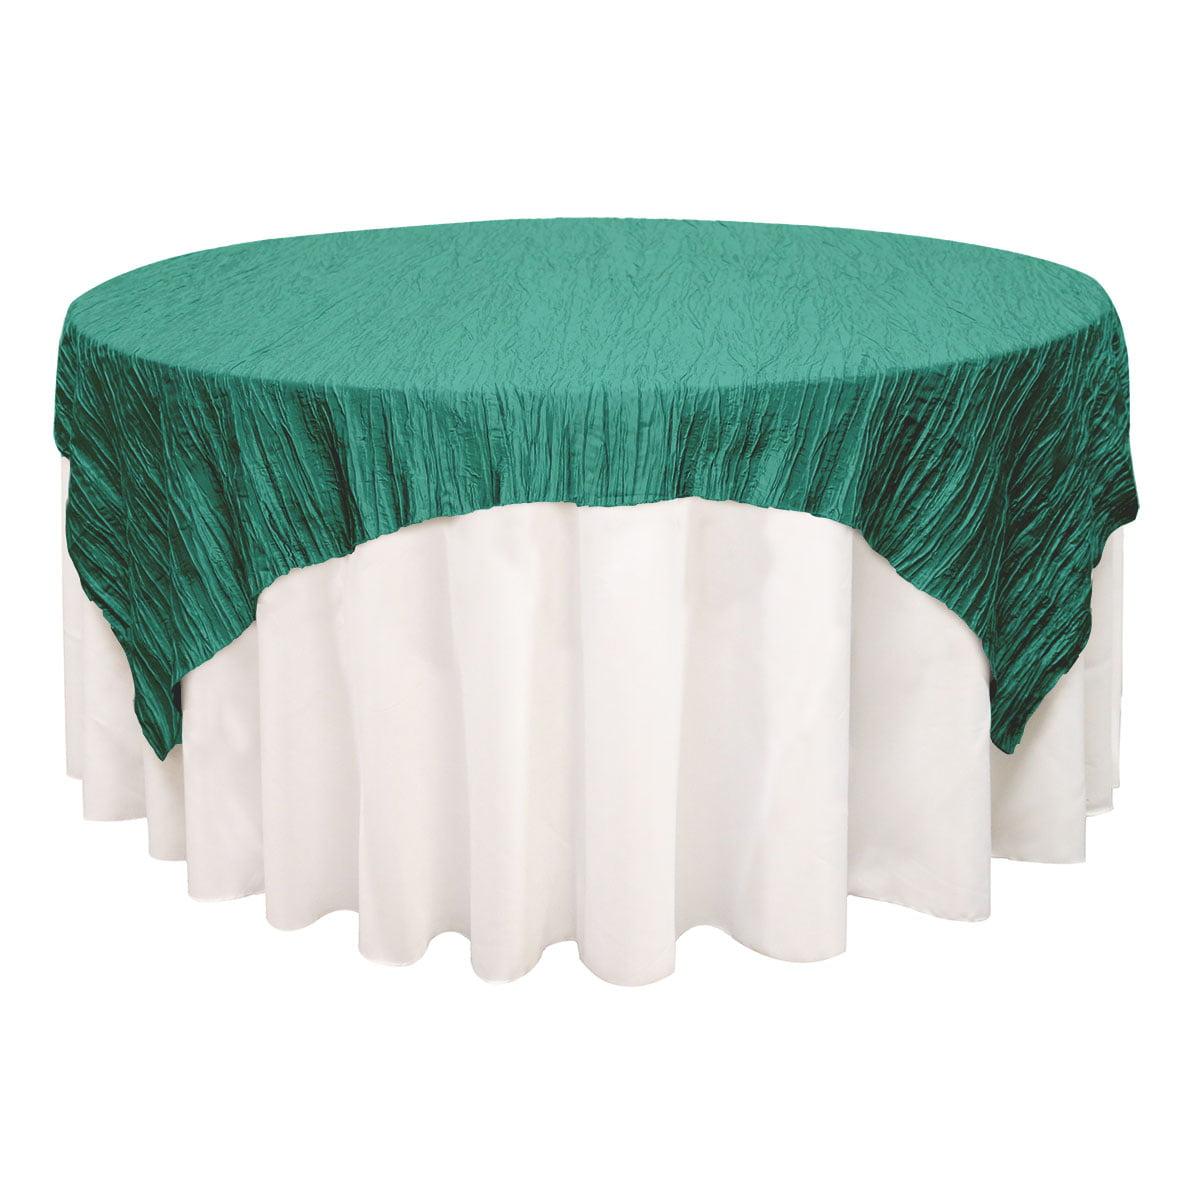 YCC Linen - 72 inch Square Crinkle Taffeta Table Overlay Blush